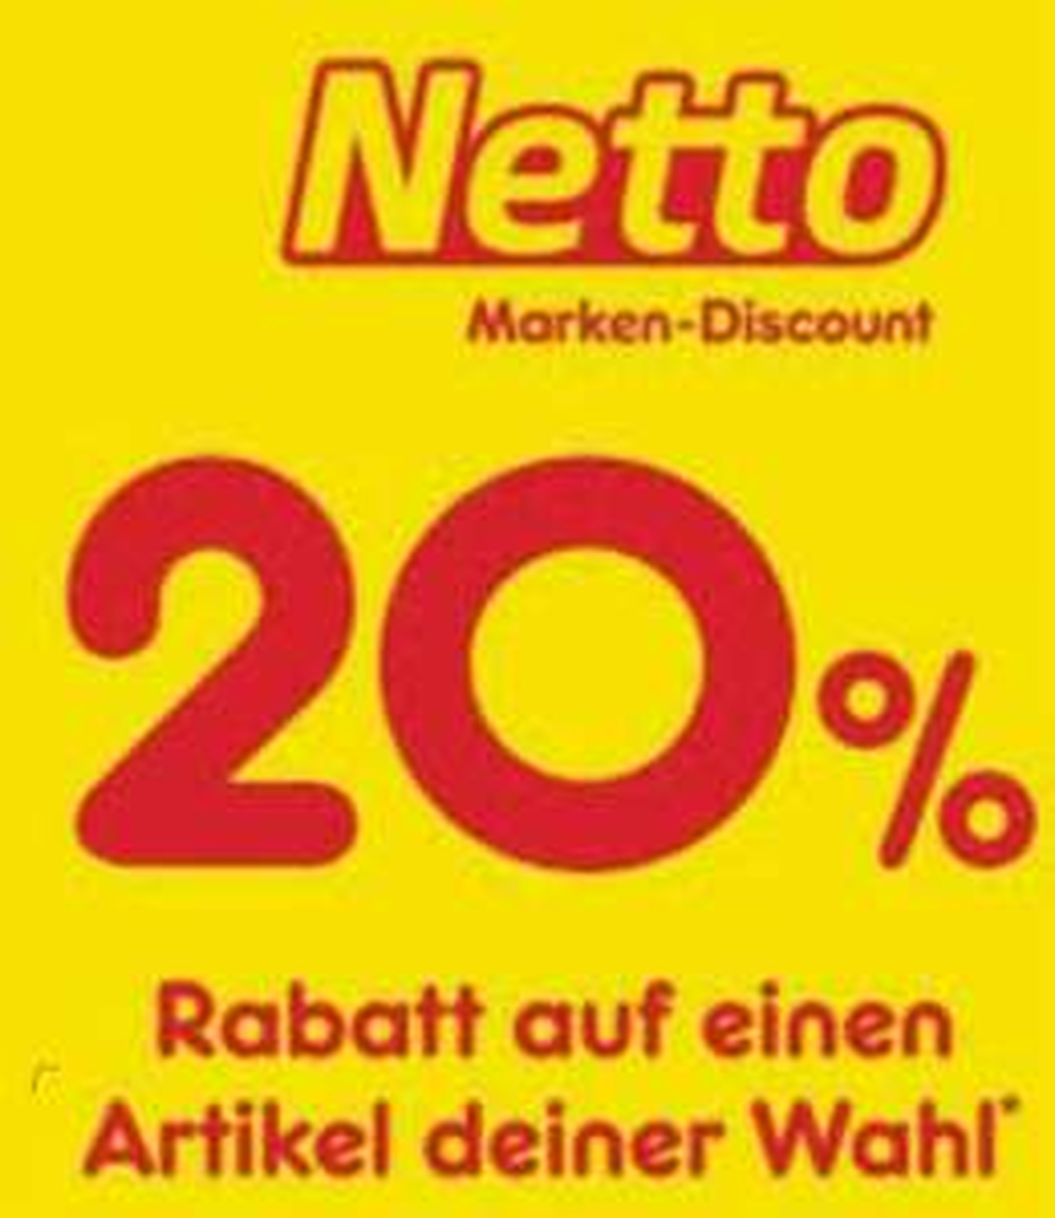 [Netto MD] Rabatt Coupons KW8 (22.02. - 27.02.), bundesweit einsetzbar